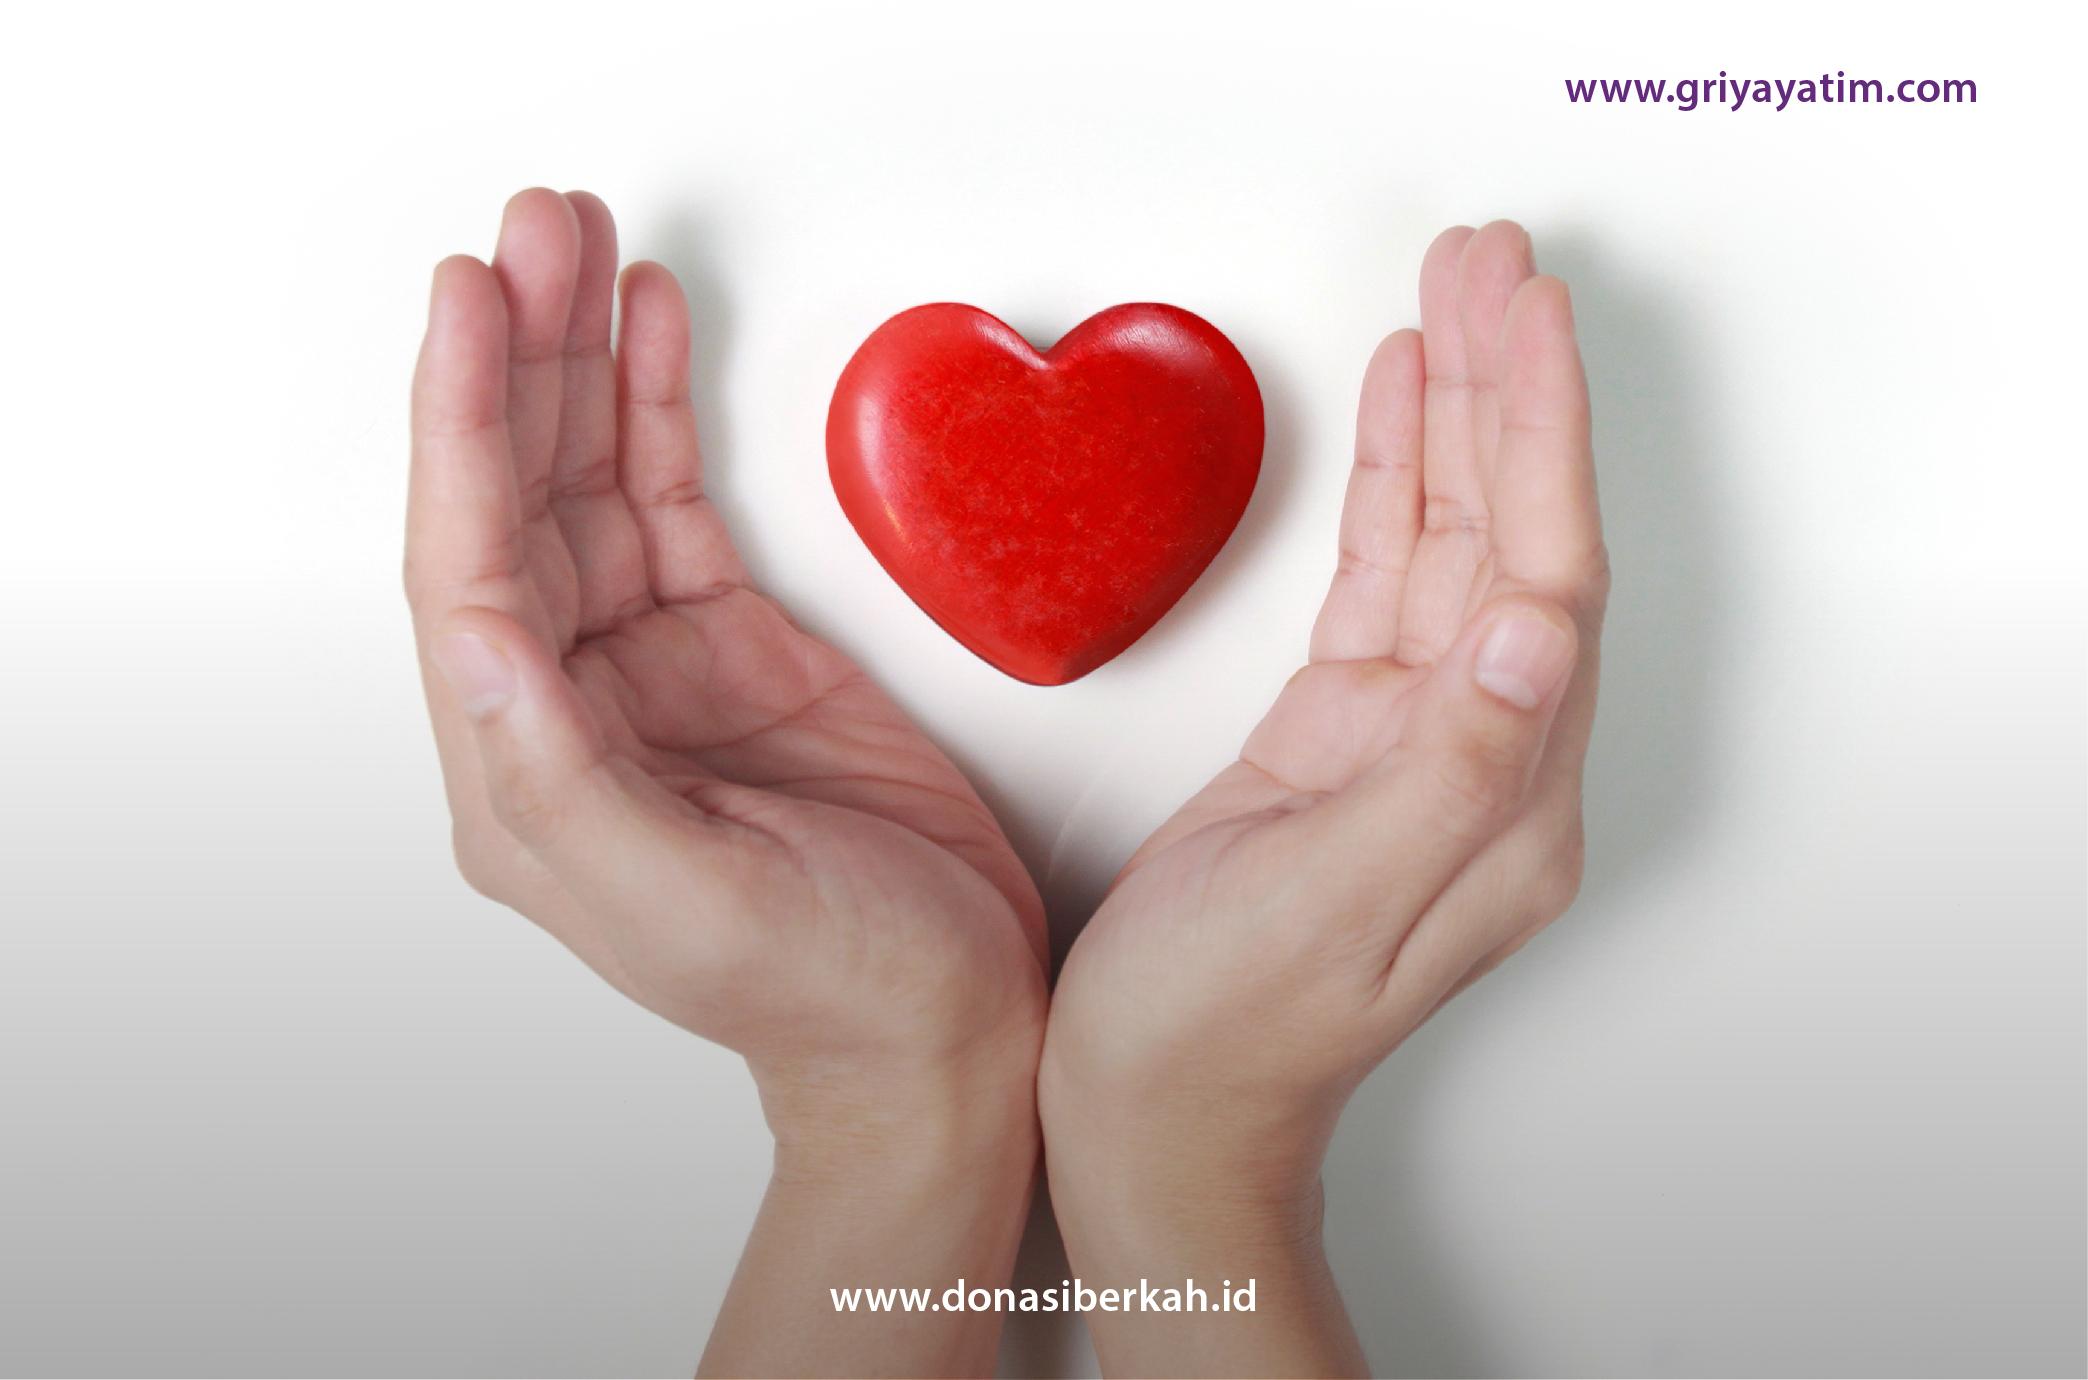 Selamatkan hati dari sifat ujub dan terlena